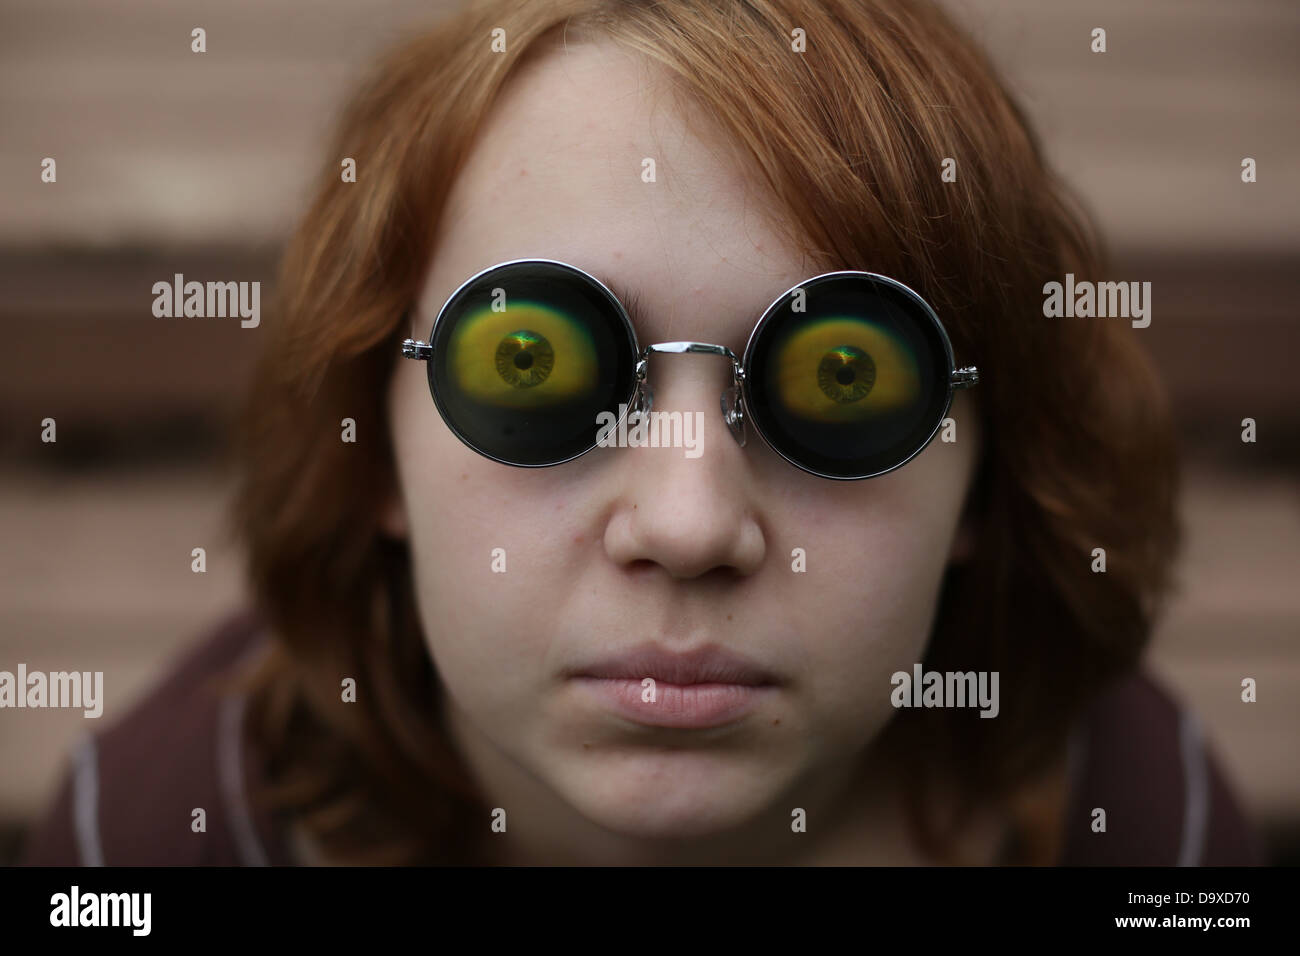 A teenage girl wearing funny eyeball glasses. - Stock Image